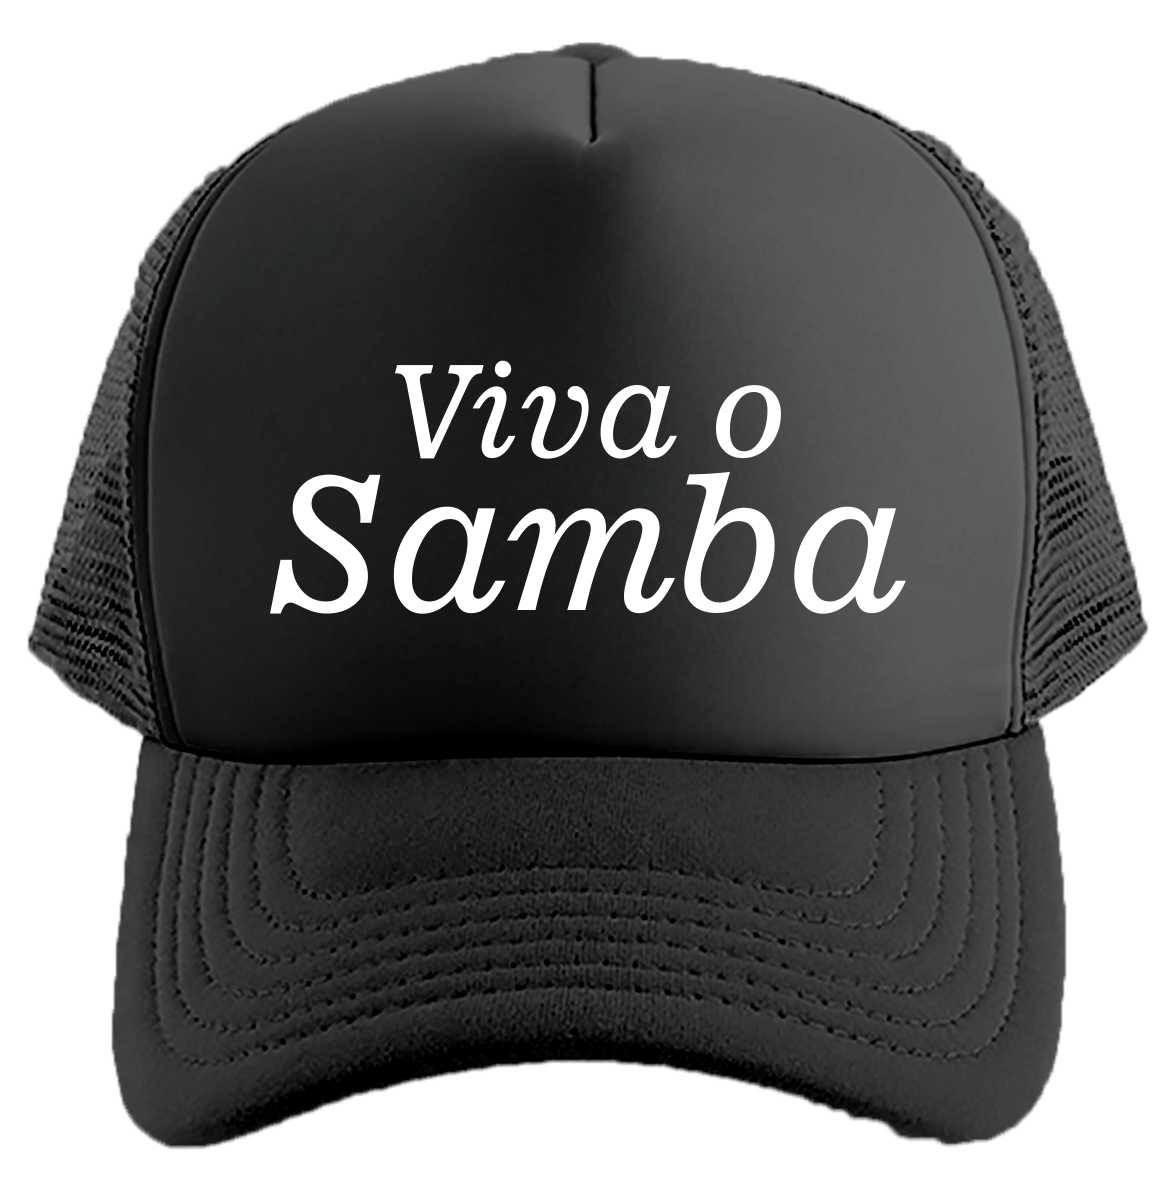 c475990d41 Boné Viva o Samba Trucker Aba Curva Telinha + Brinde no Elo7 ...